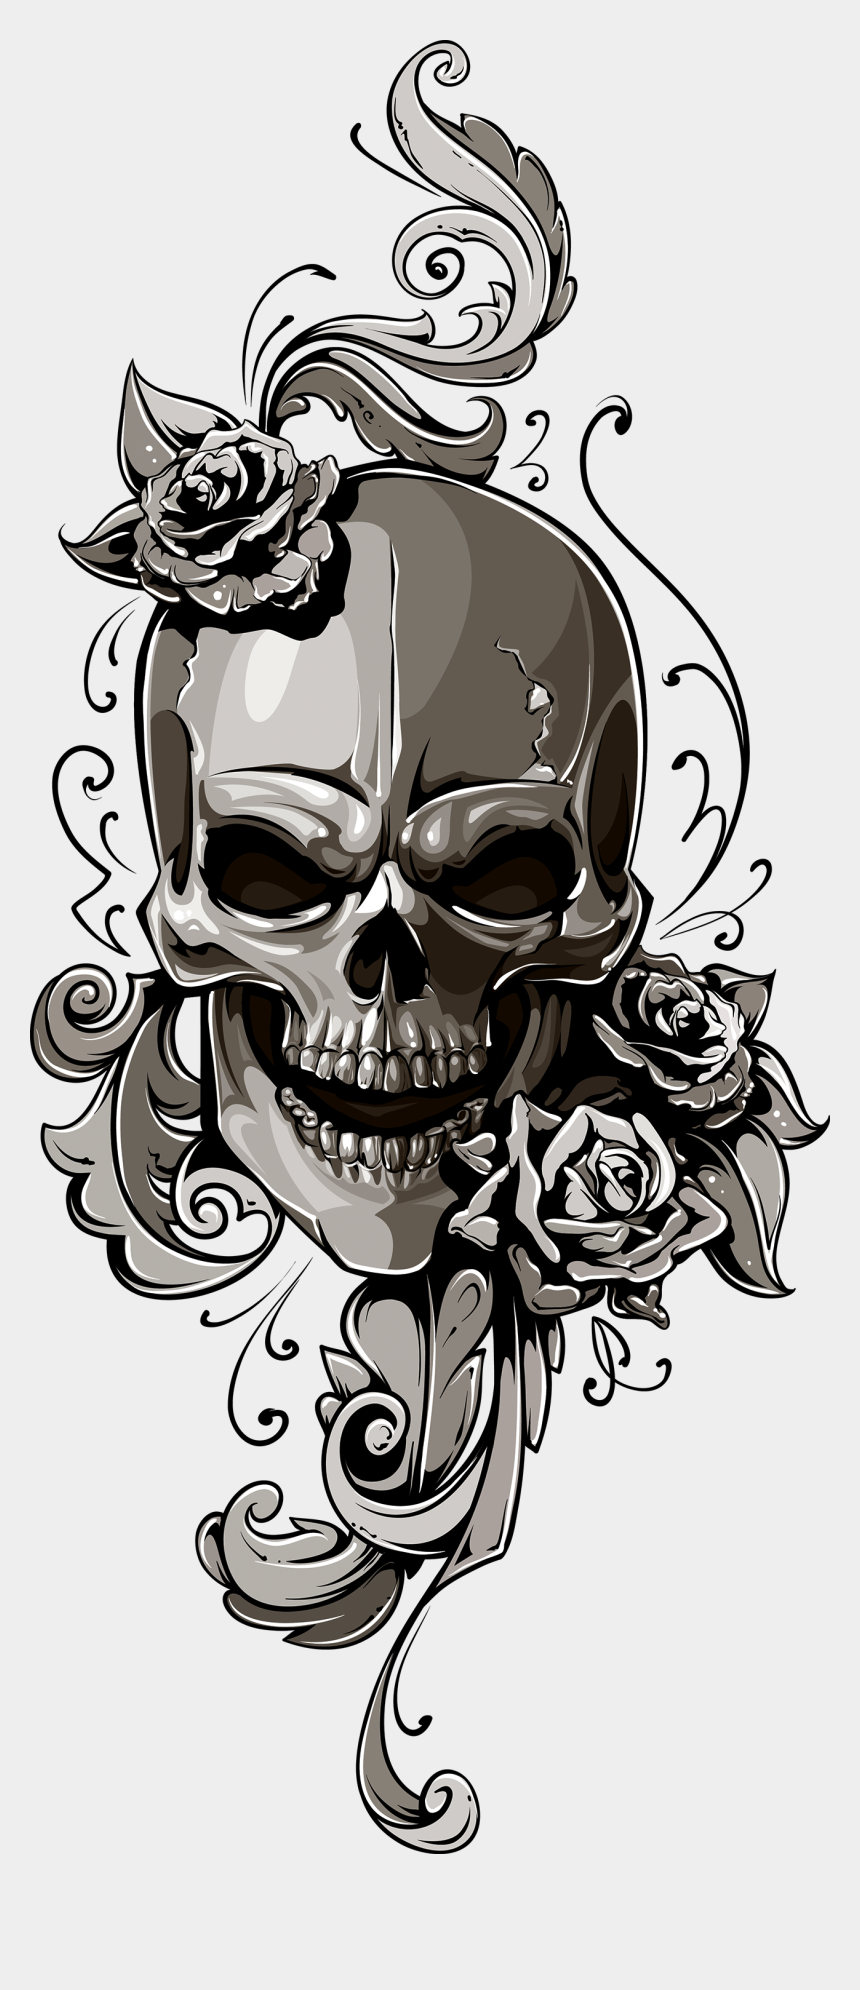 human head clipart, Cartoons - School Old Skull Human Symbolism Clipart - Tattoo Skull Old School